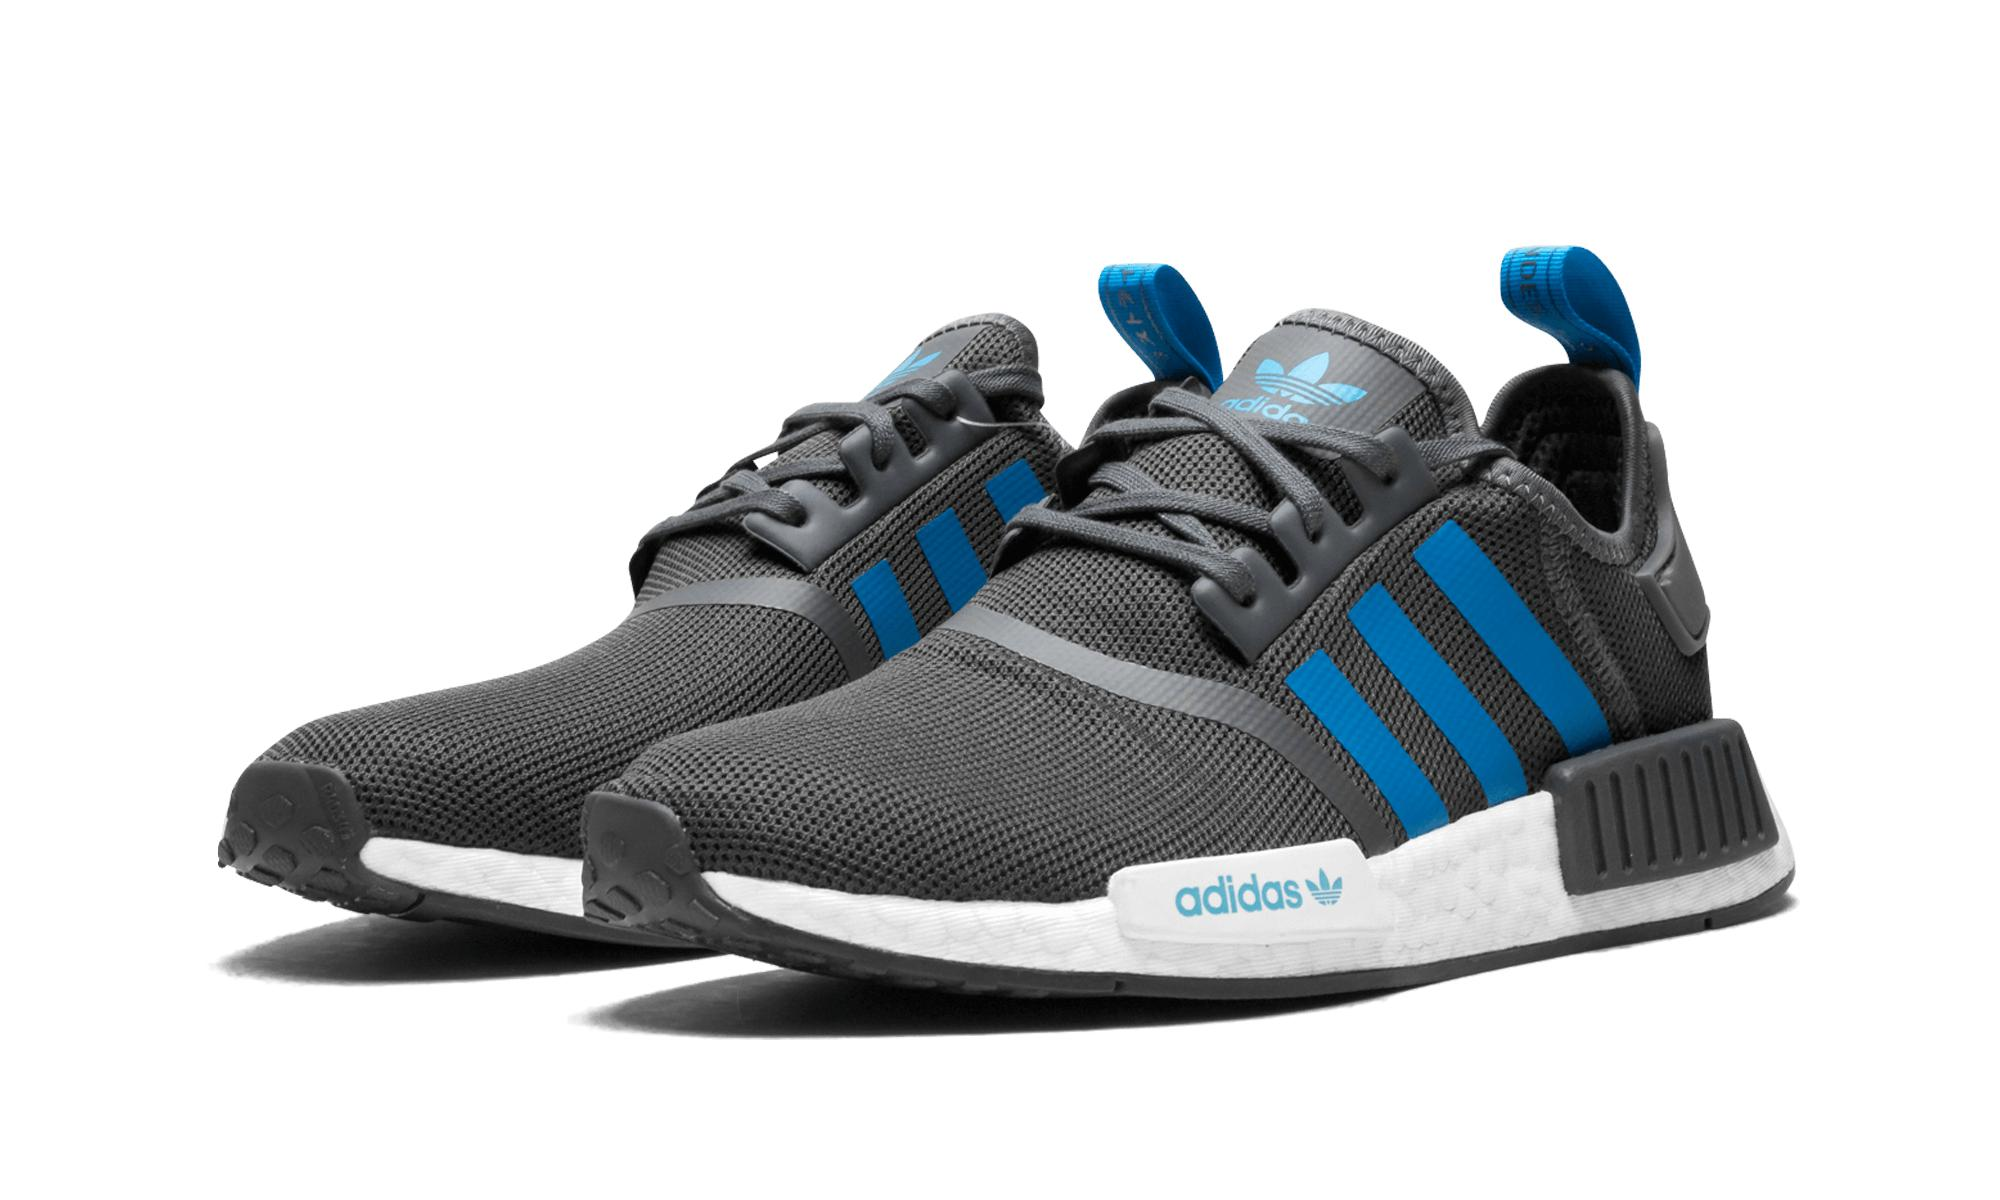 ADIDAS NMD_R1 黑藍 休閒鞋 運動鞋 D96688